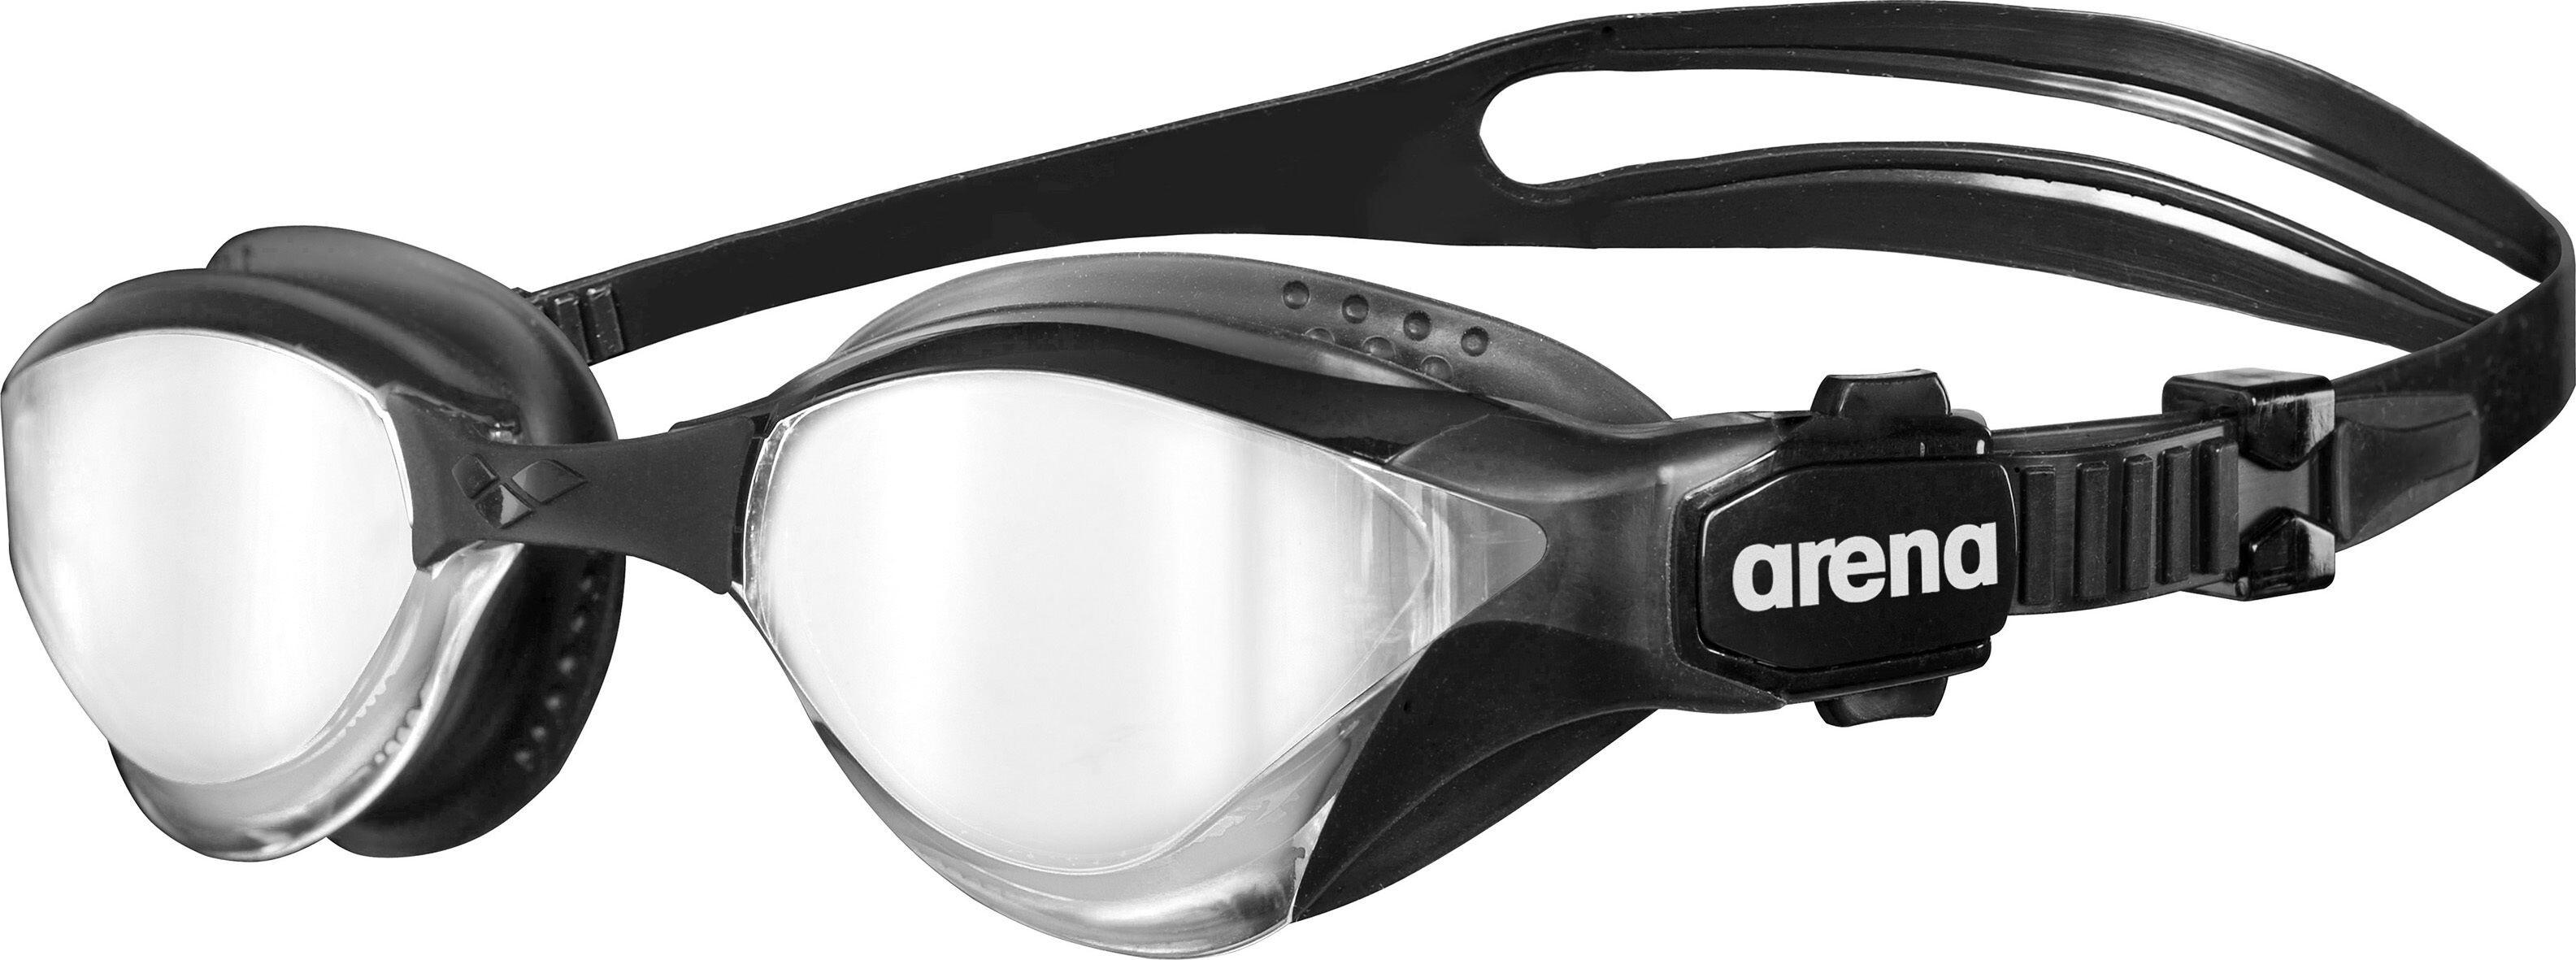 04d1b9356fe arena Cobra Tri Mirror Svømmebriller, silver-black-black | Find ...